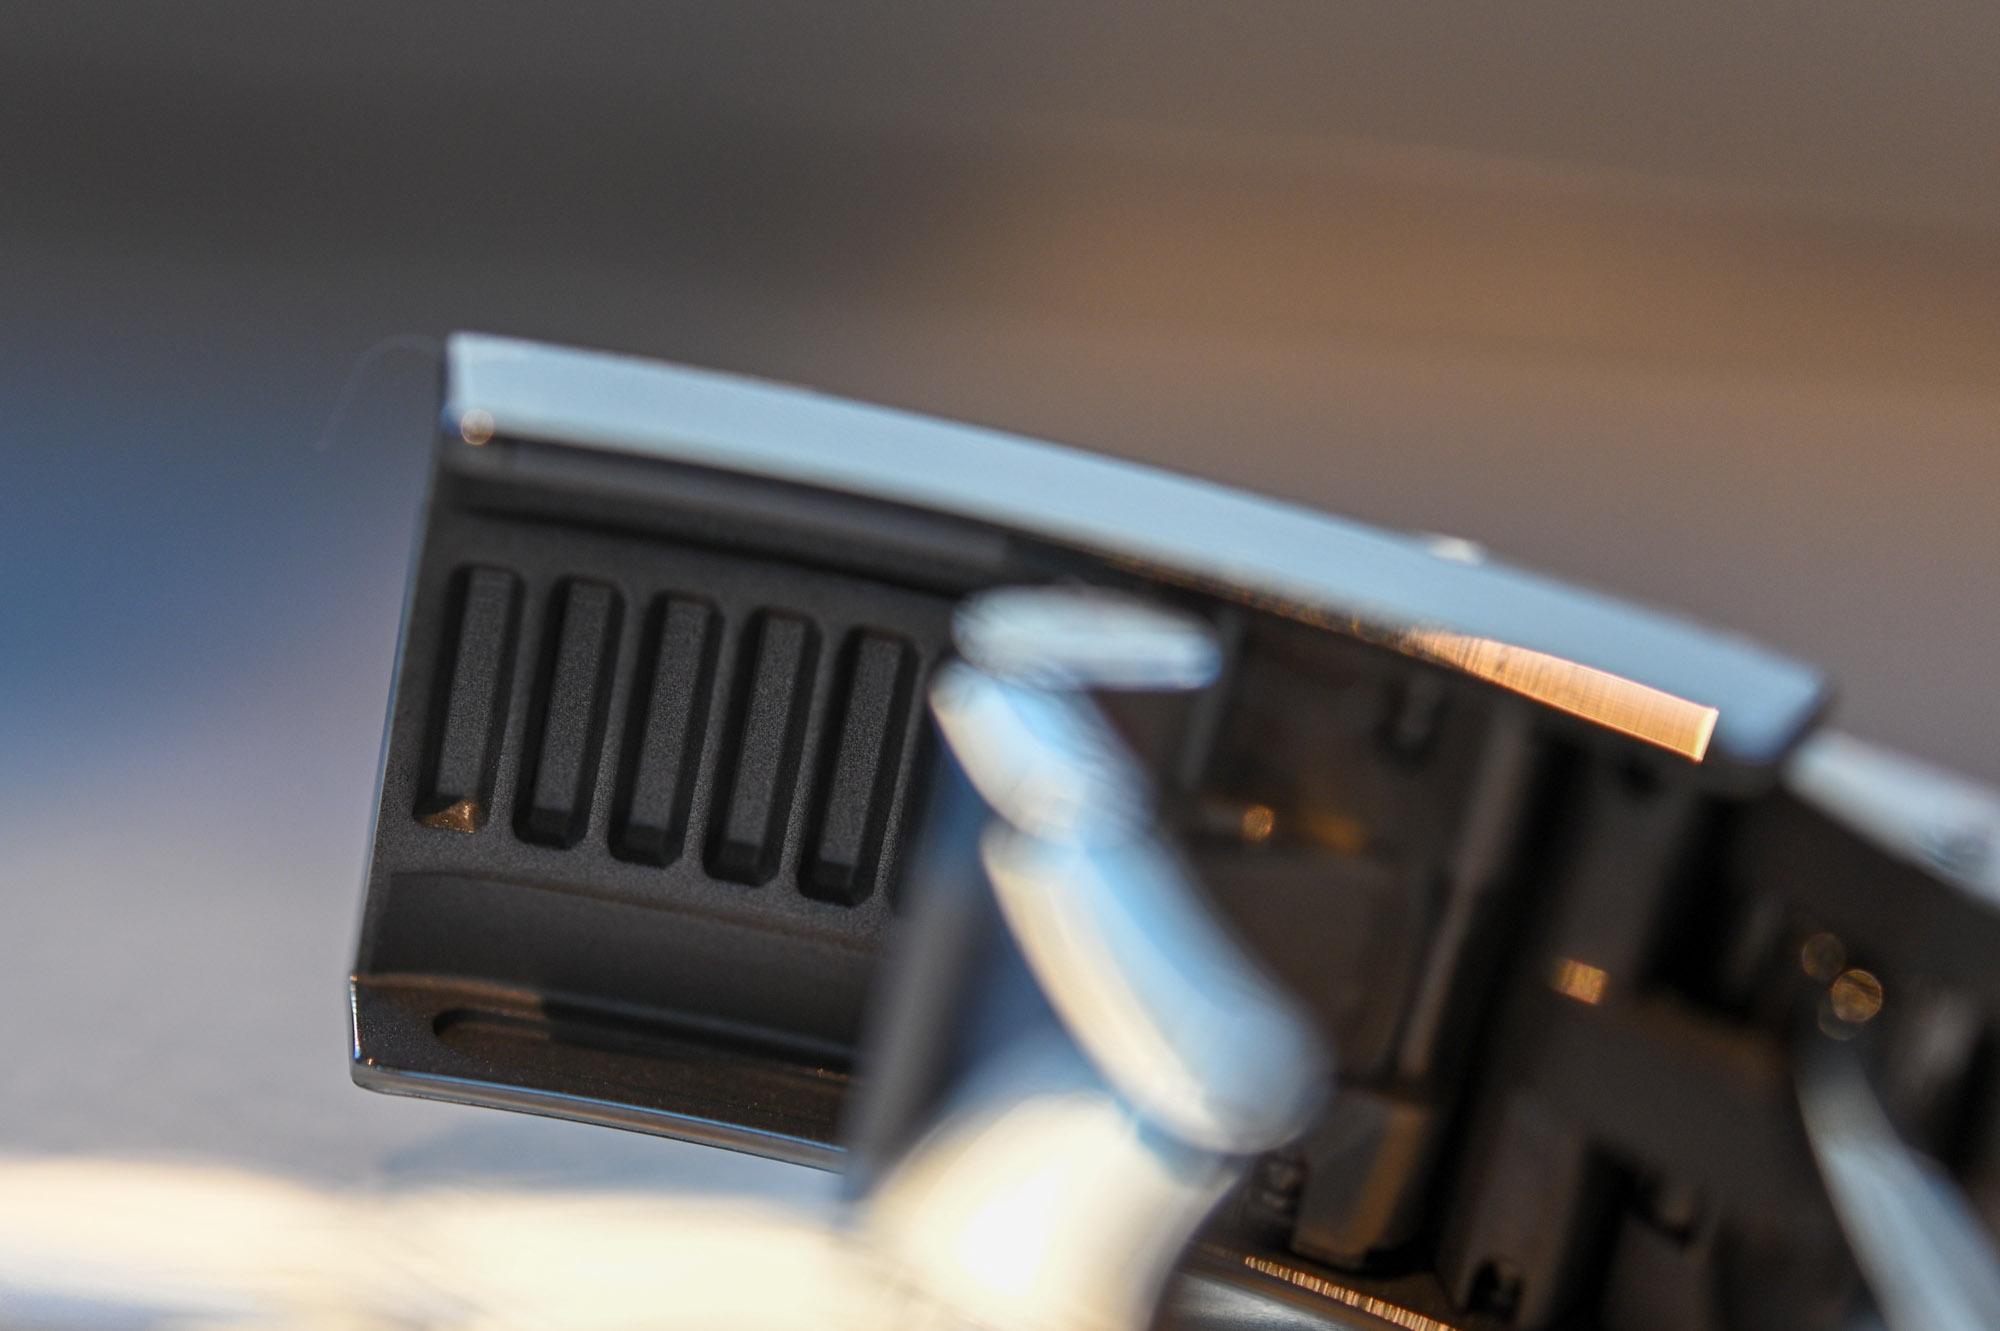 Rolex - fine adjustment